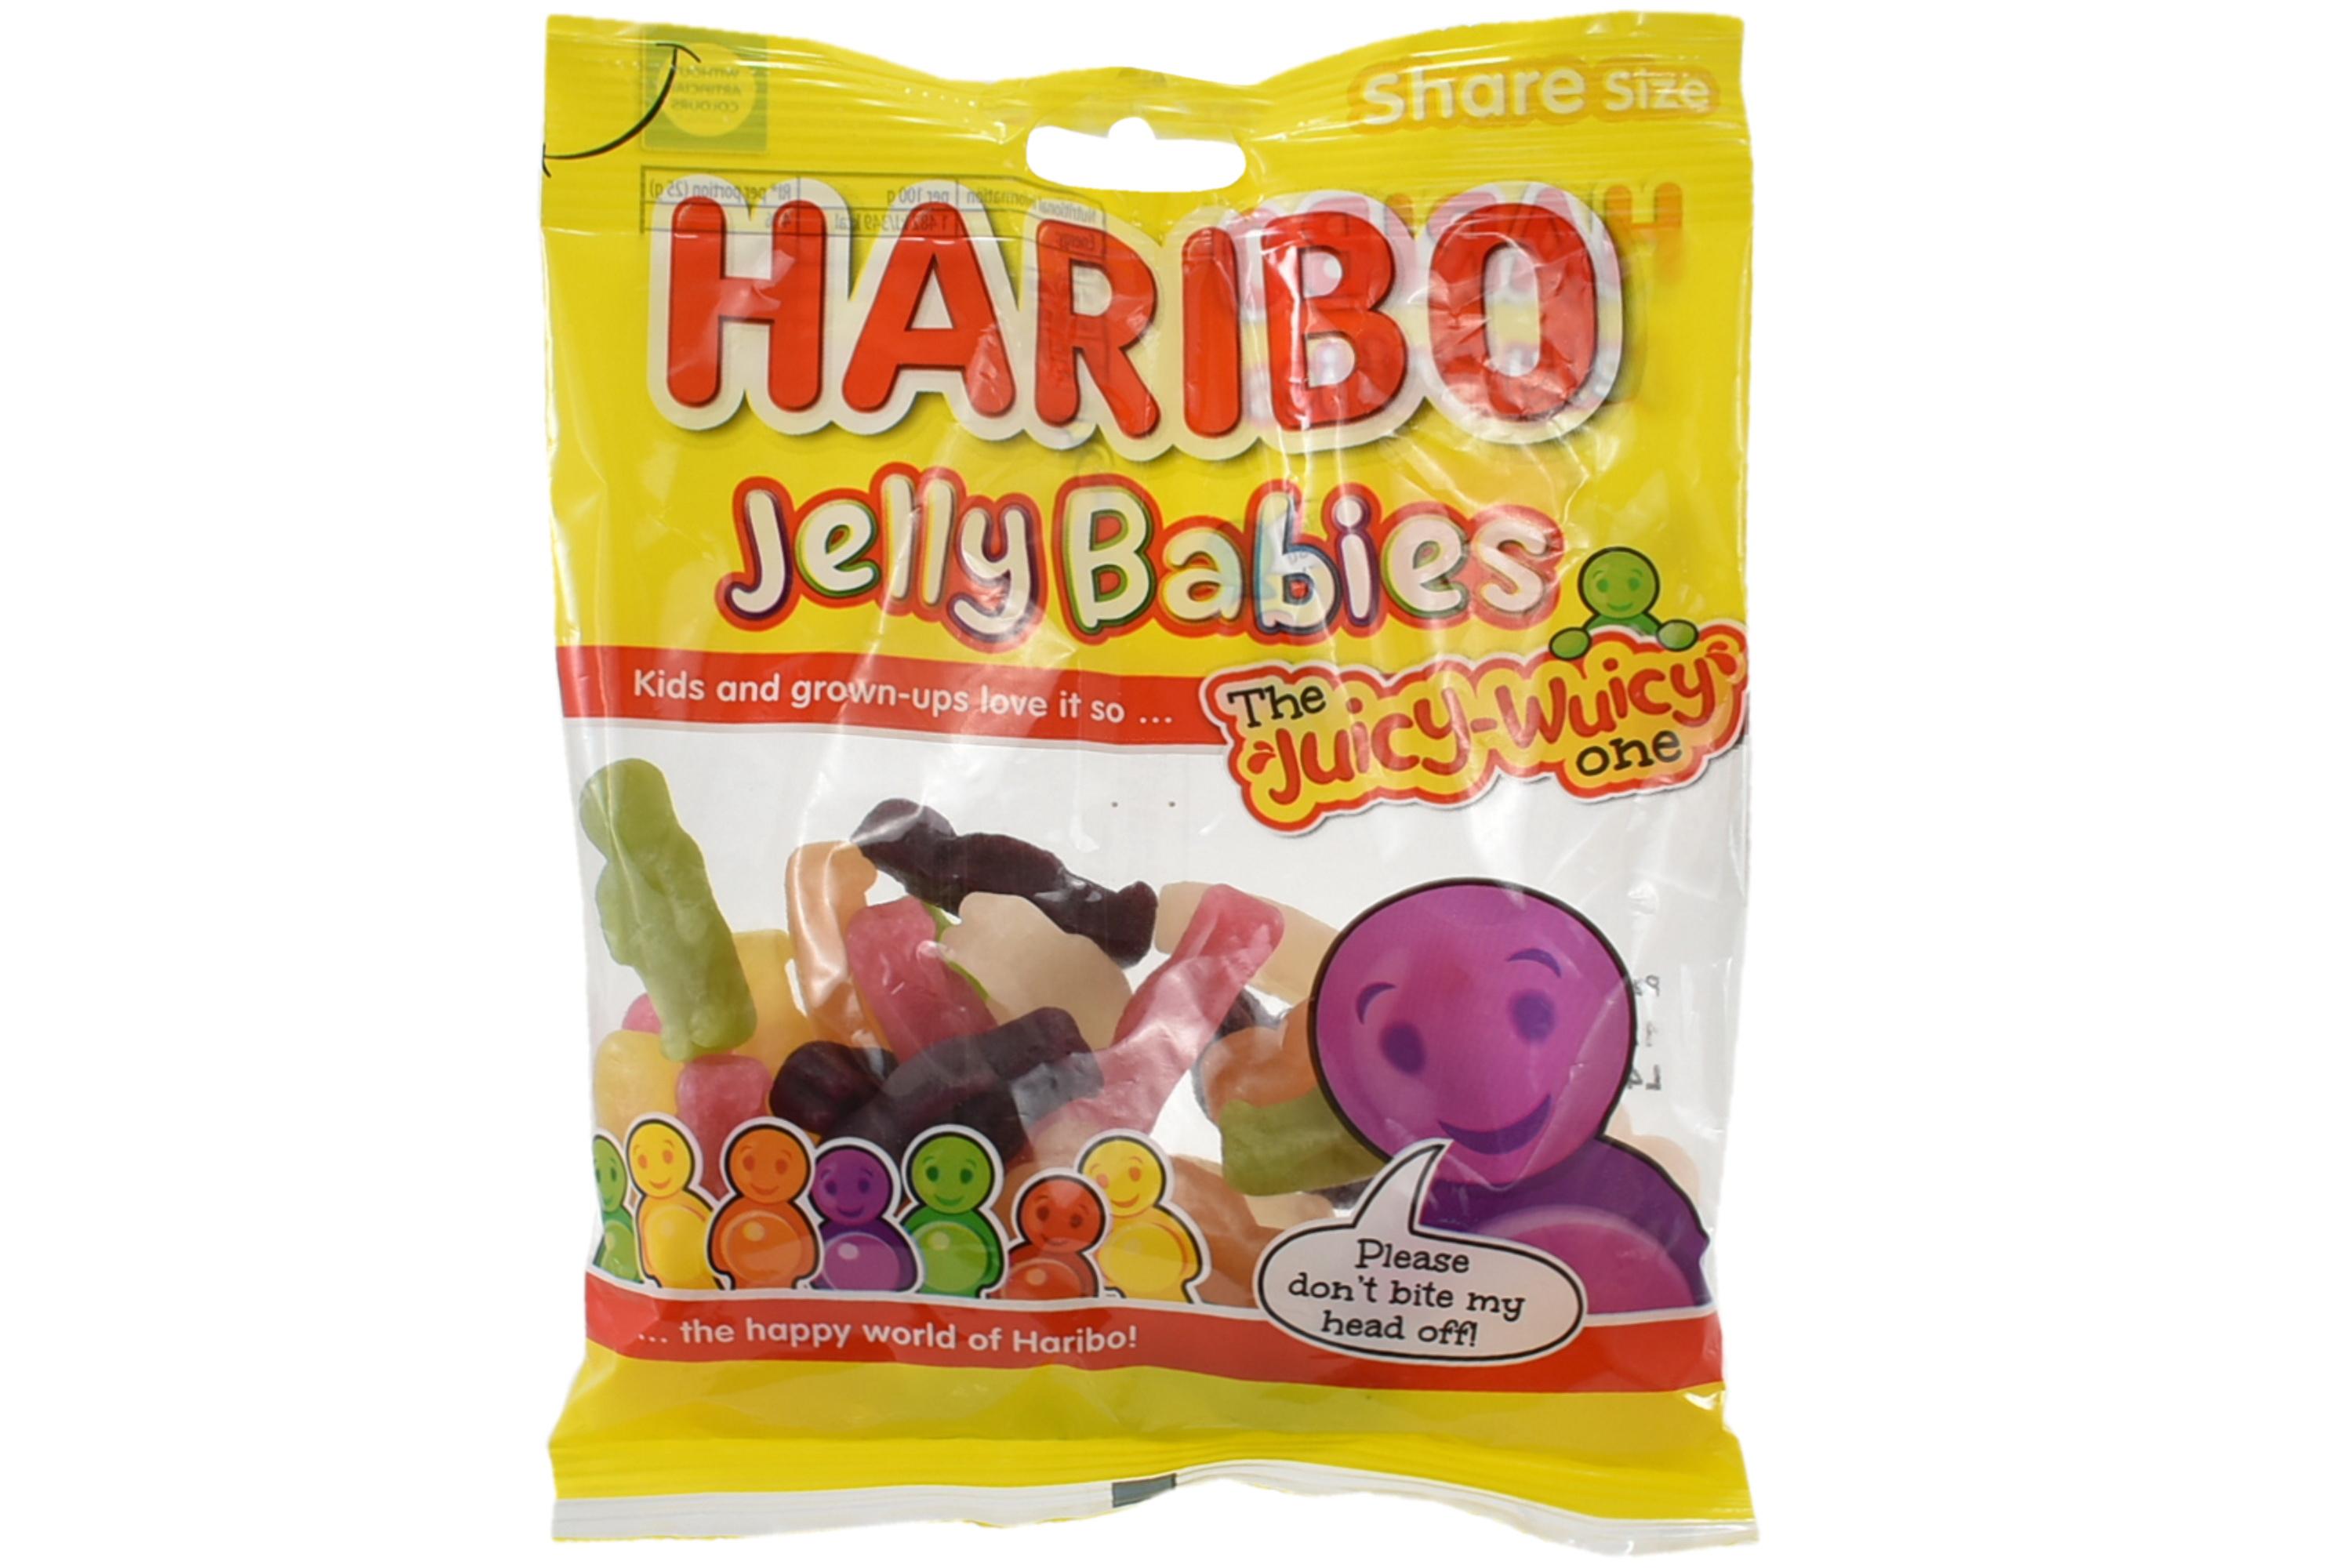 140g Jelly Babies Prepack - Haribo